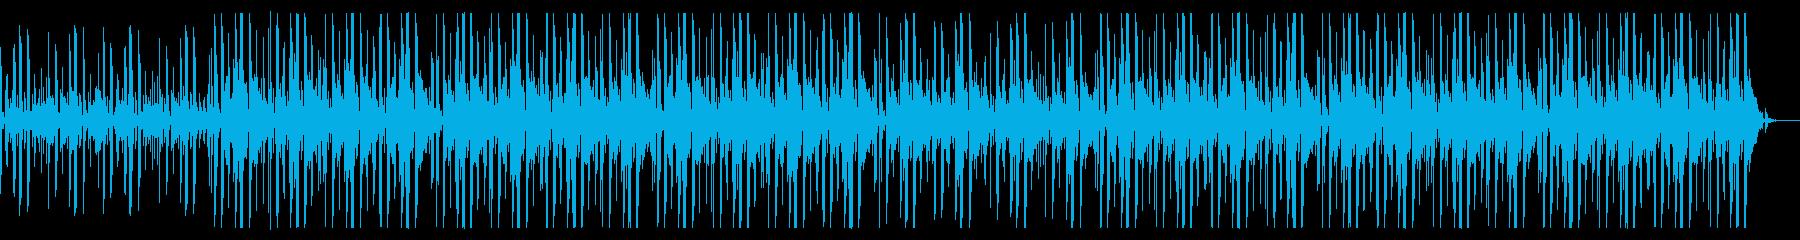 VP・トーク・おしゃれな情報発信時に最適の再生済みの波形